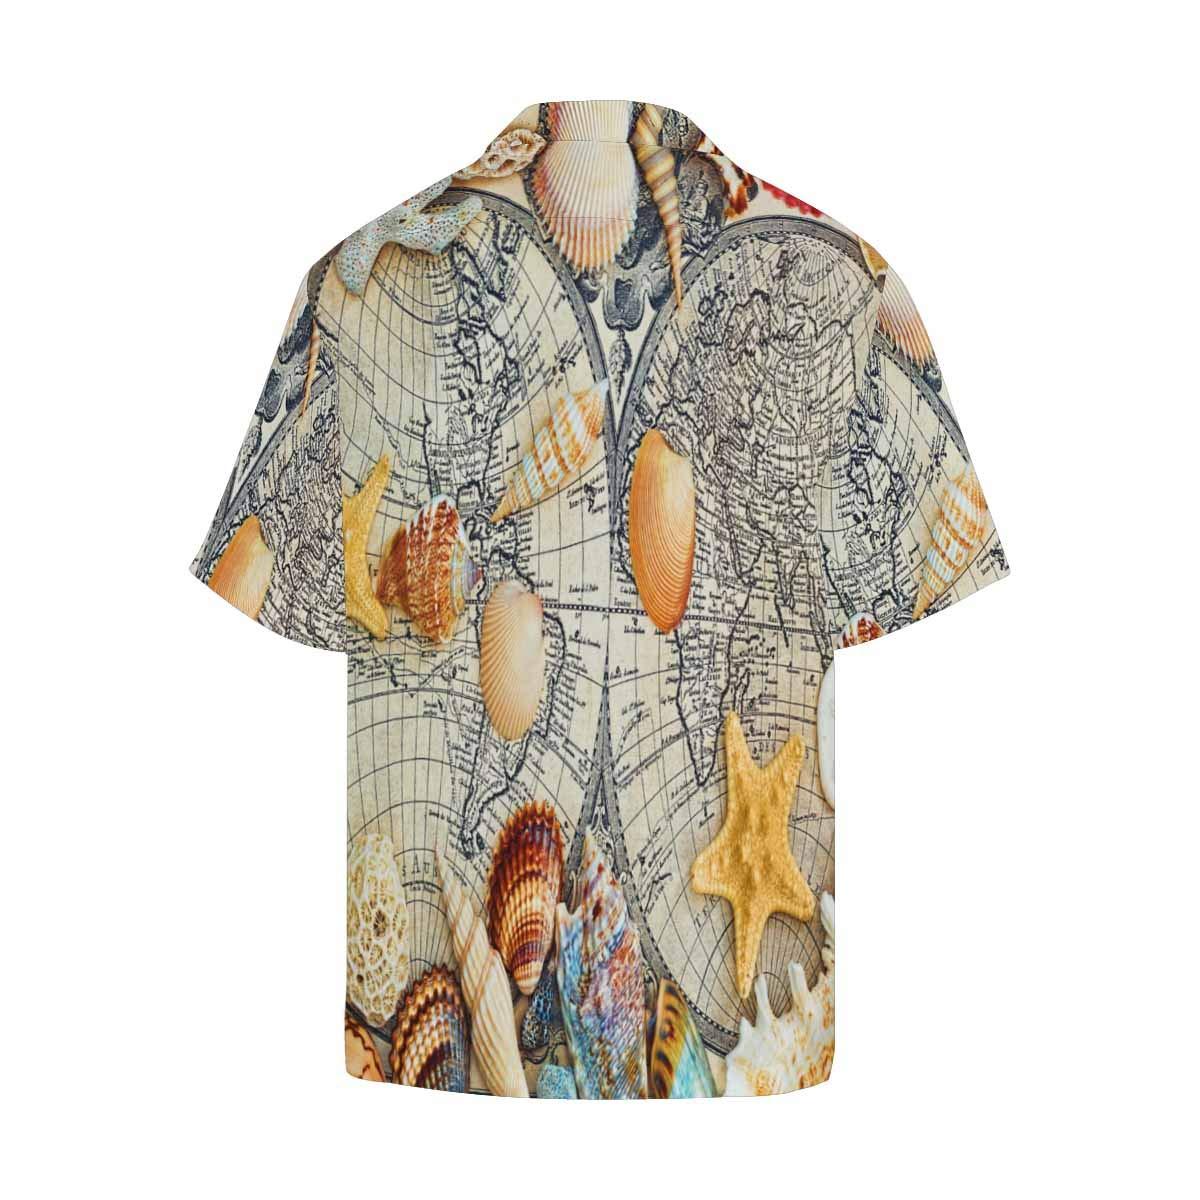 InterestPrint Comfortably Collared Sea Shells Casual Shirts V-Neck Short Sleeve Beach Top